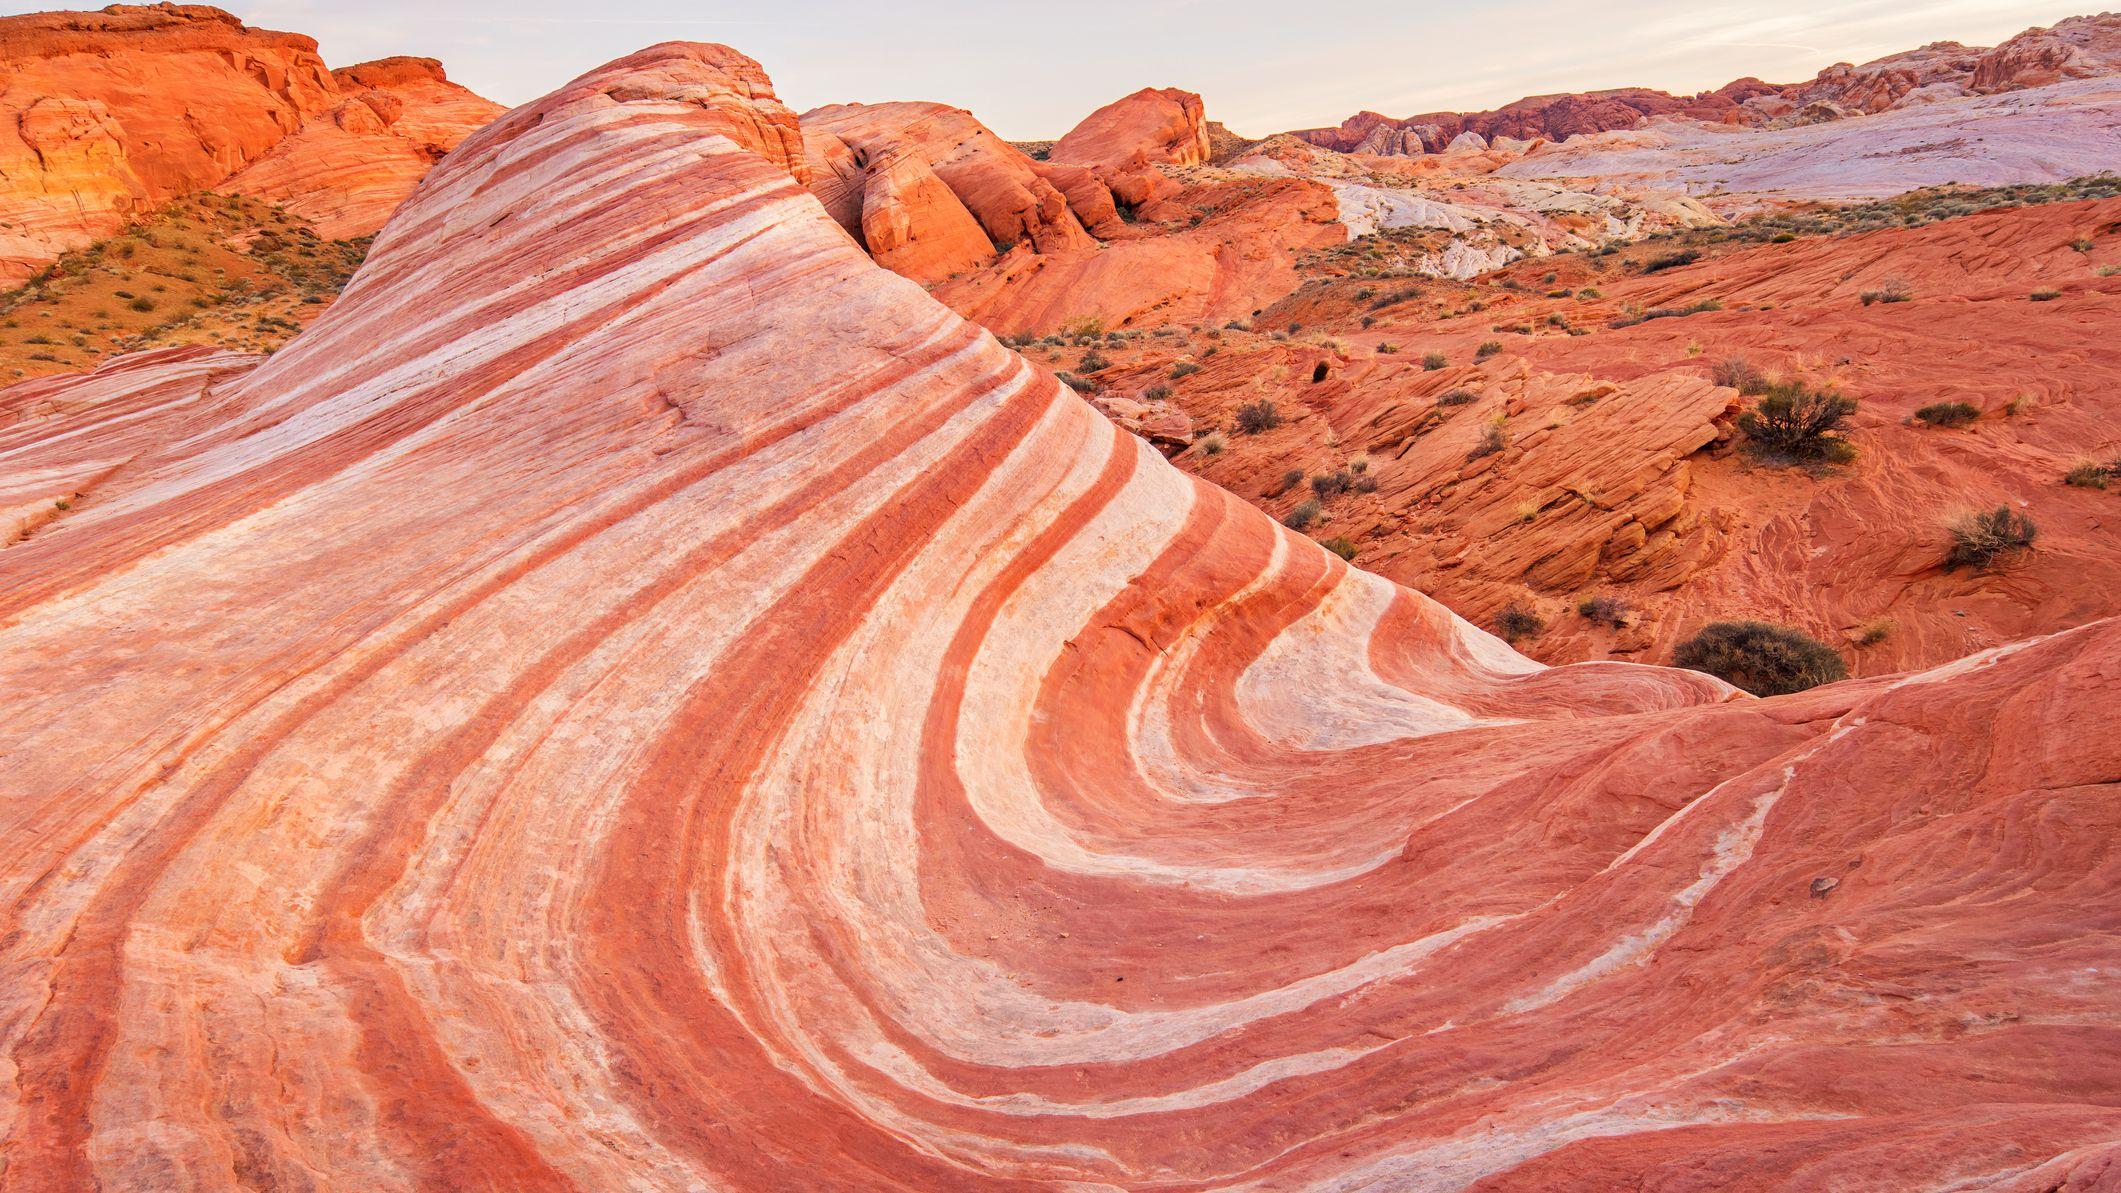 Definition sedimentary rock sediment